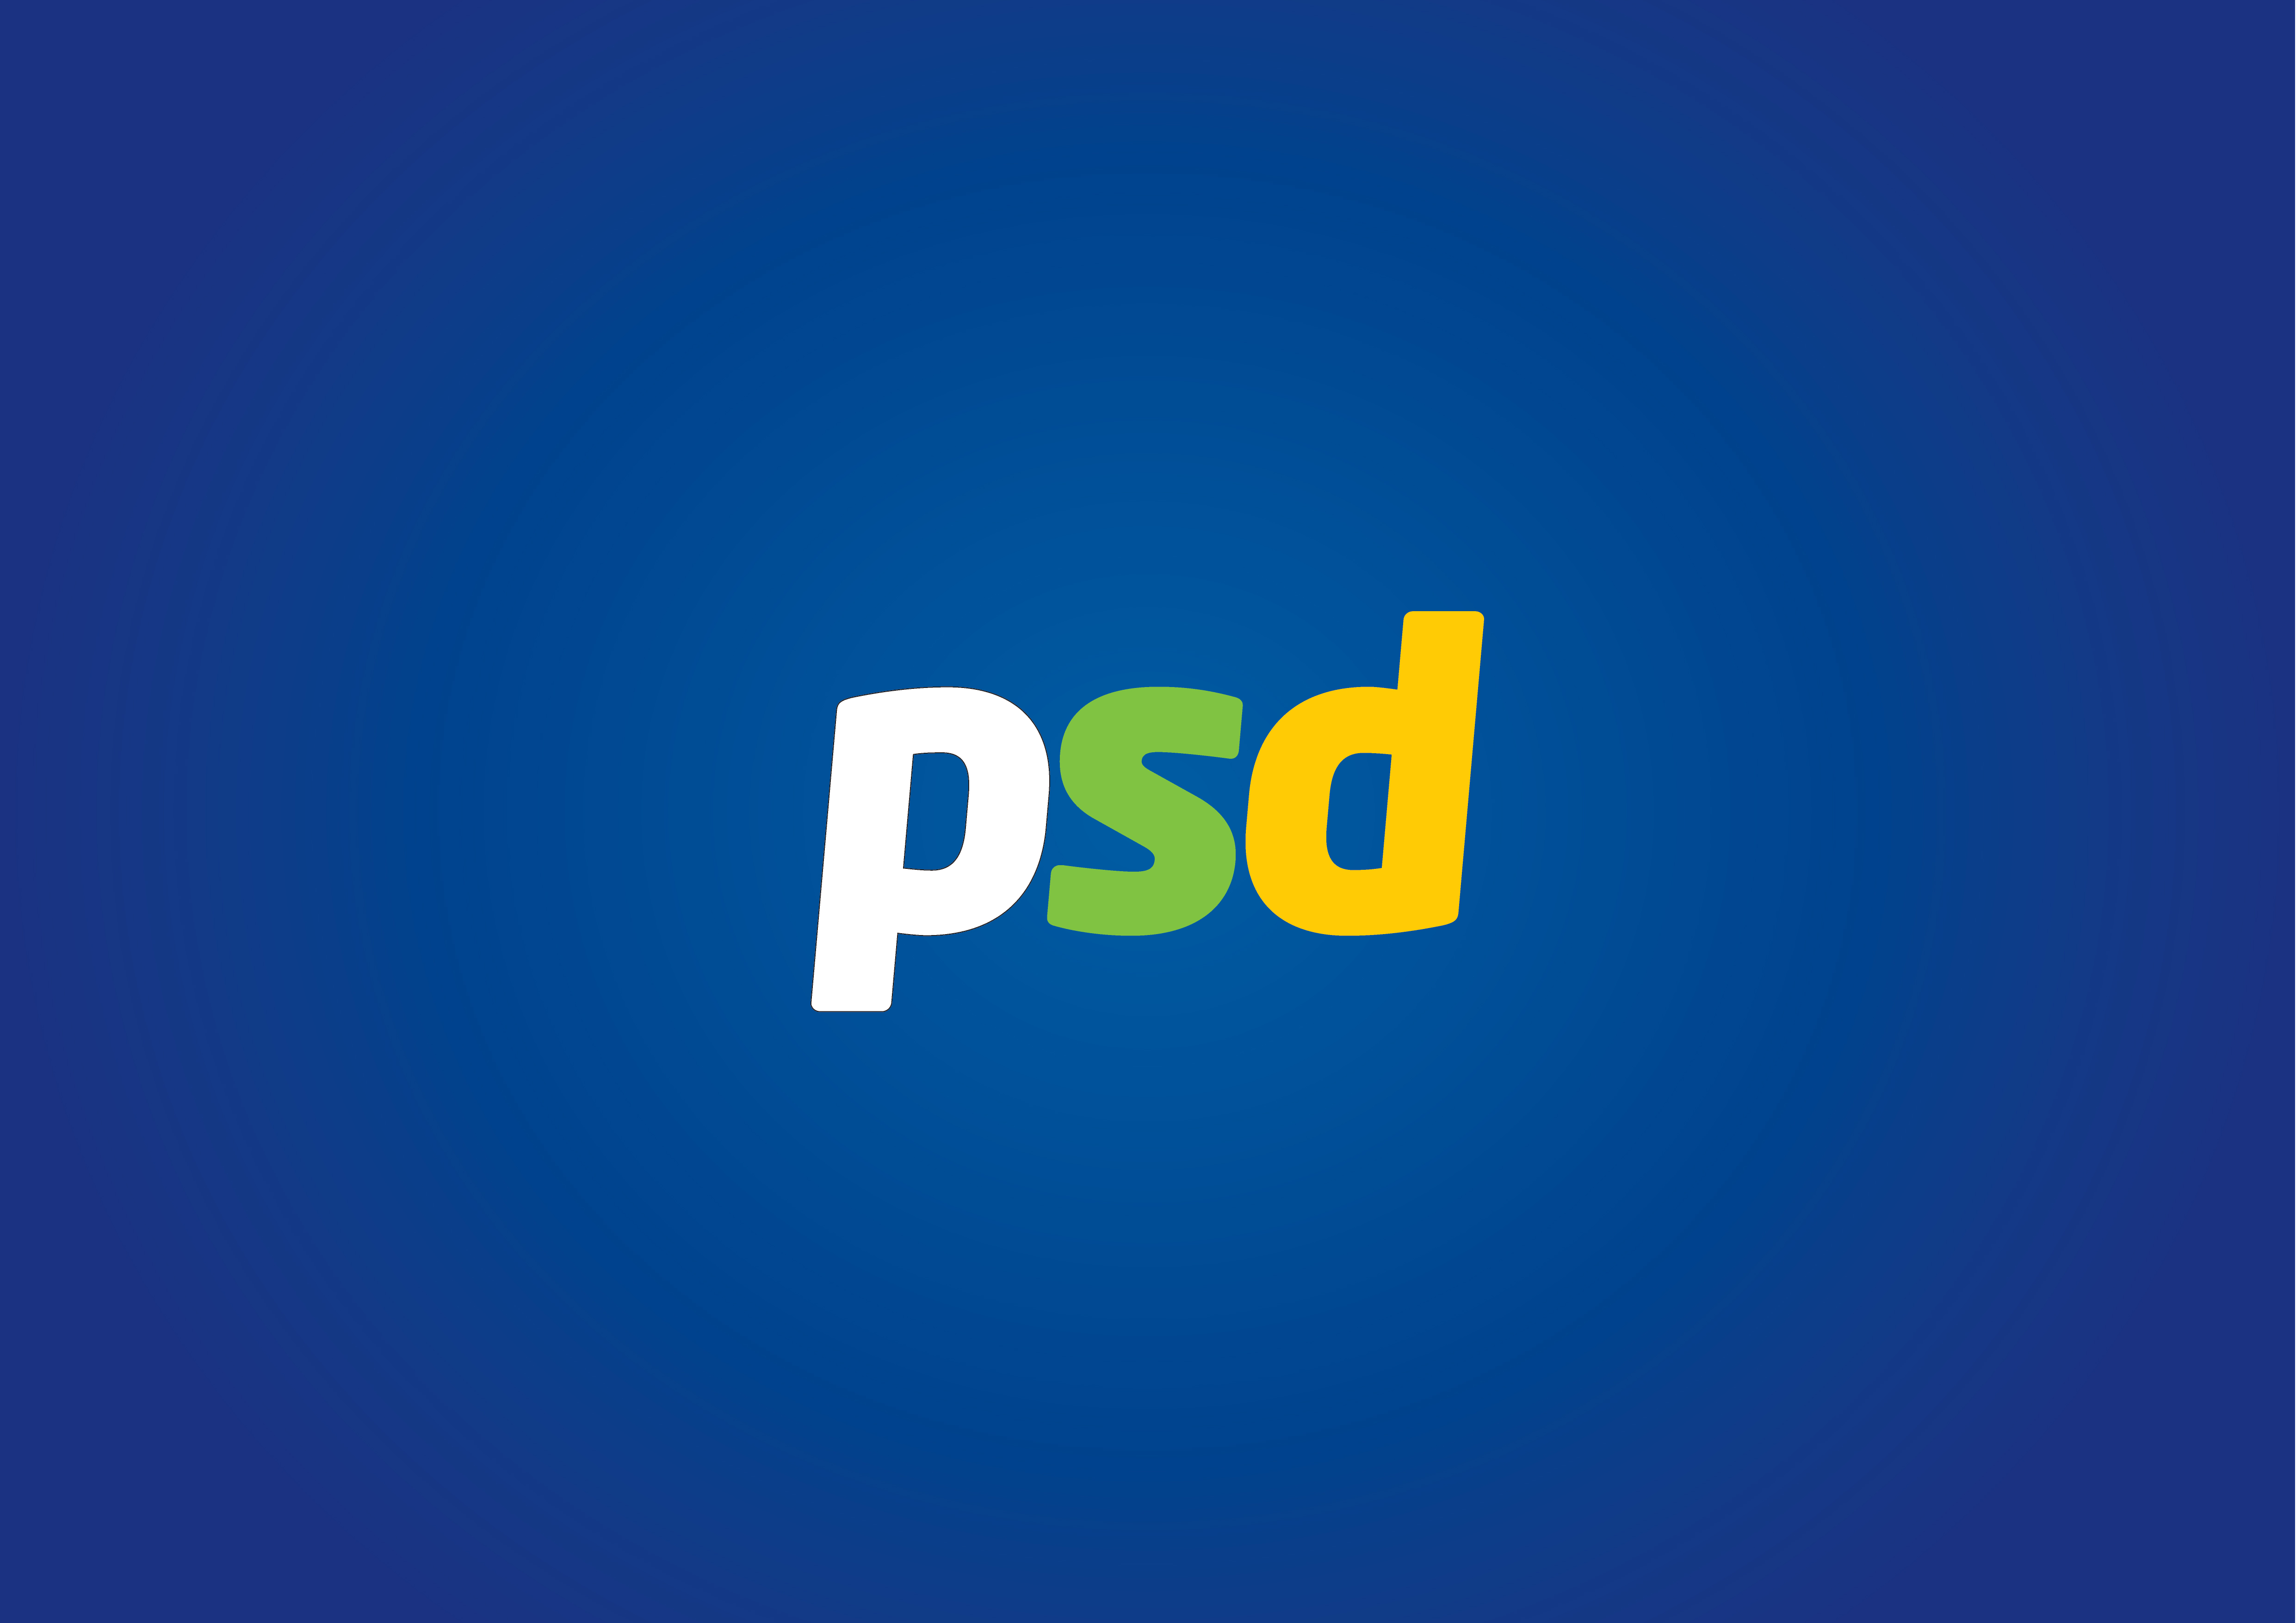 PSD Logo - Partido Social Democrático Logo.